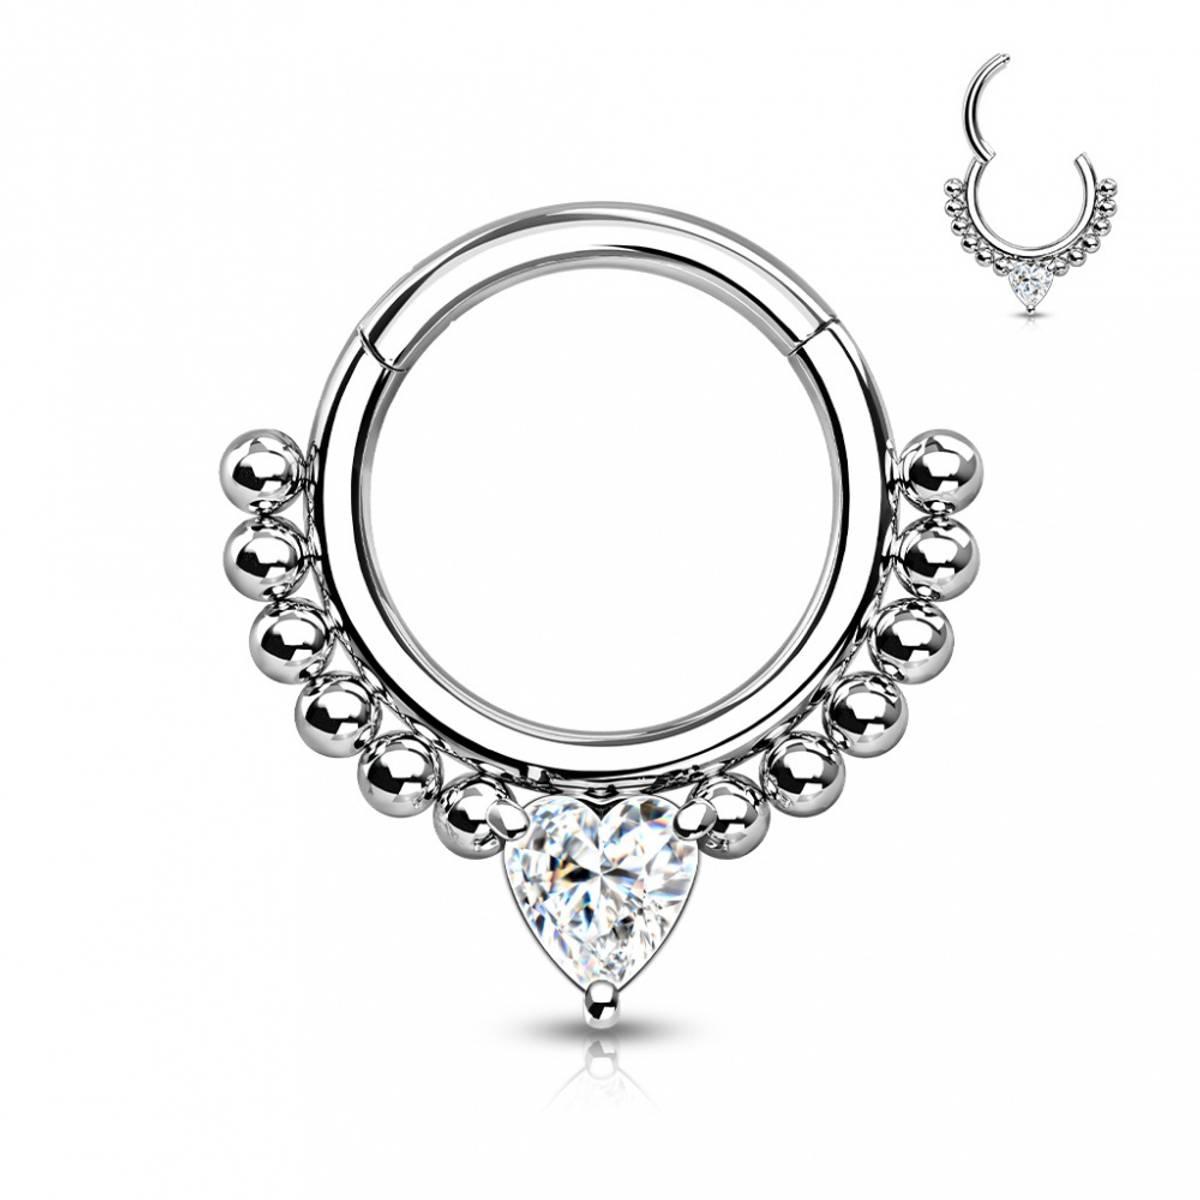 Heartless Front Facing Hinged Ring